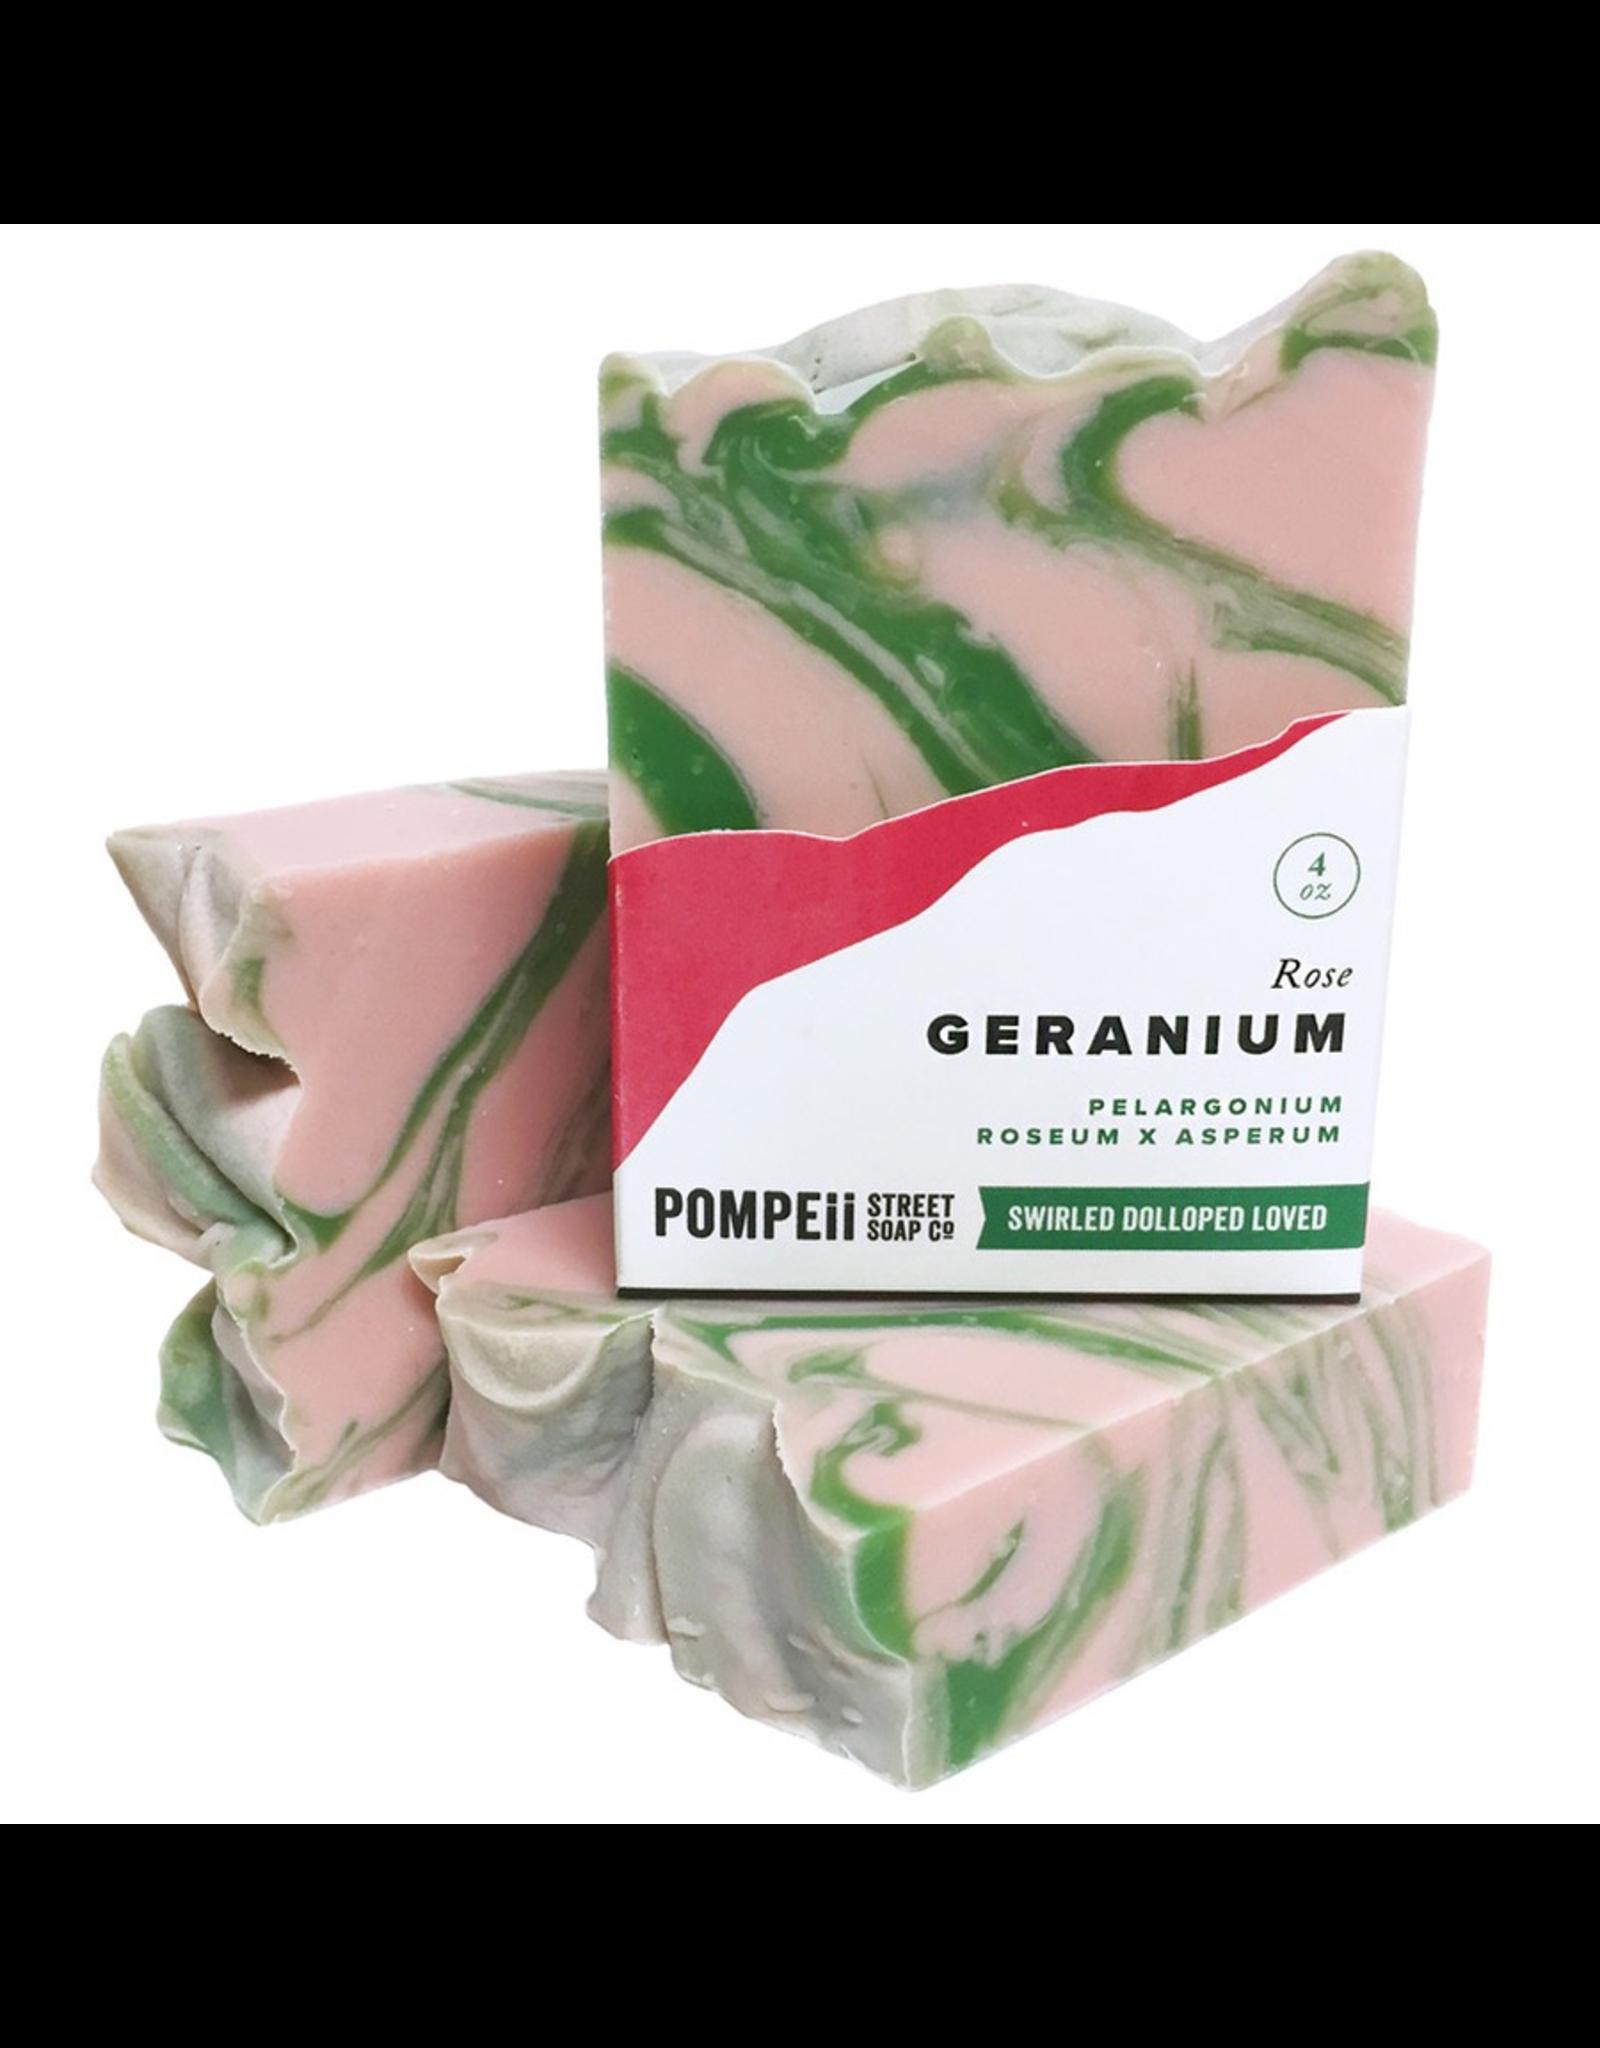 Rose Geranium Soap 4 oz.